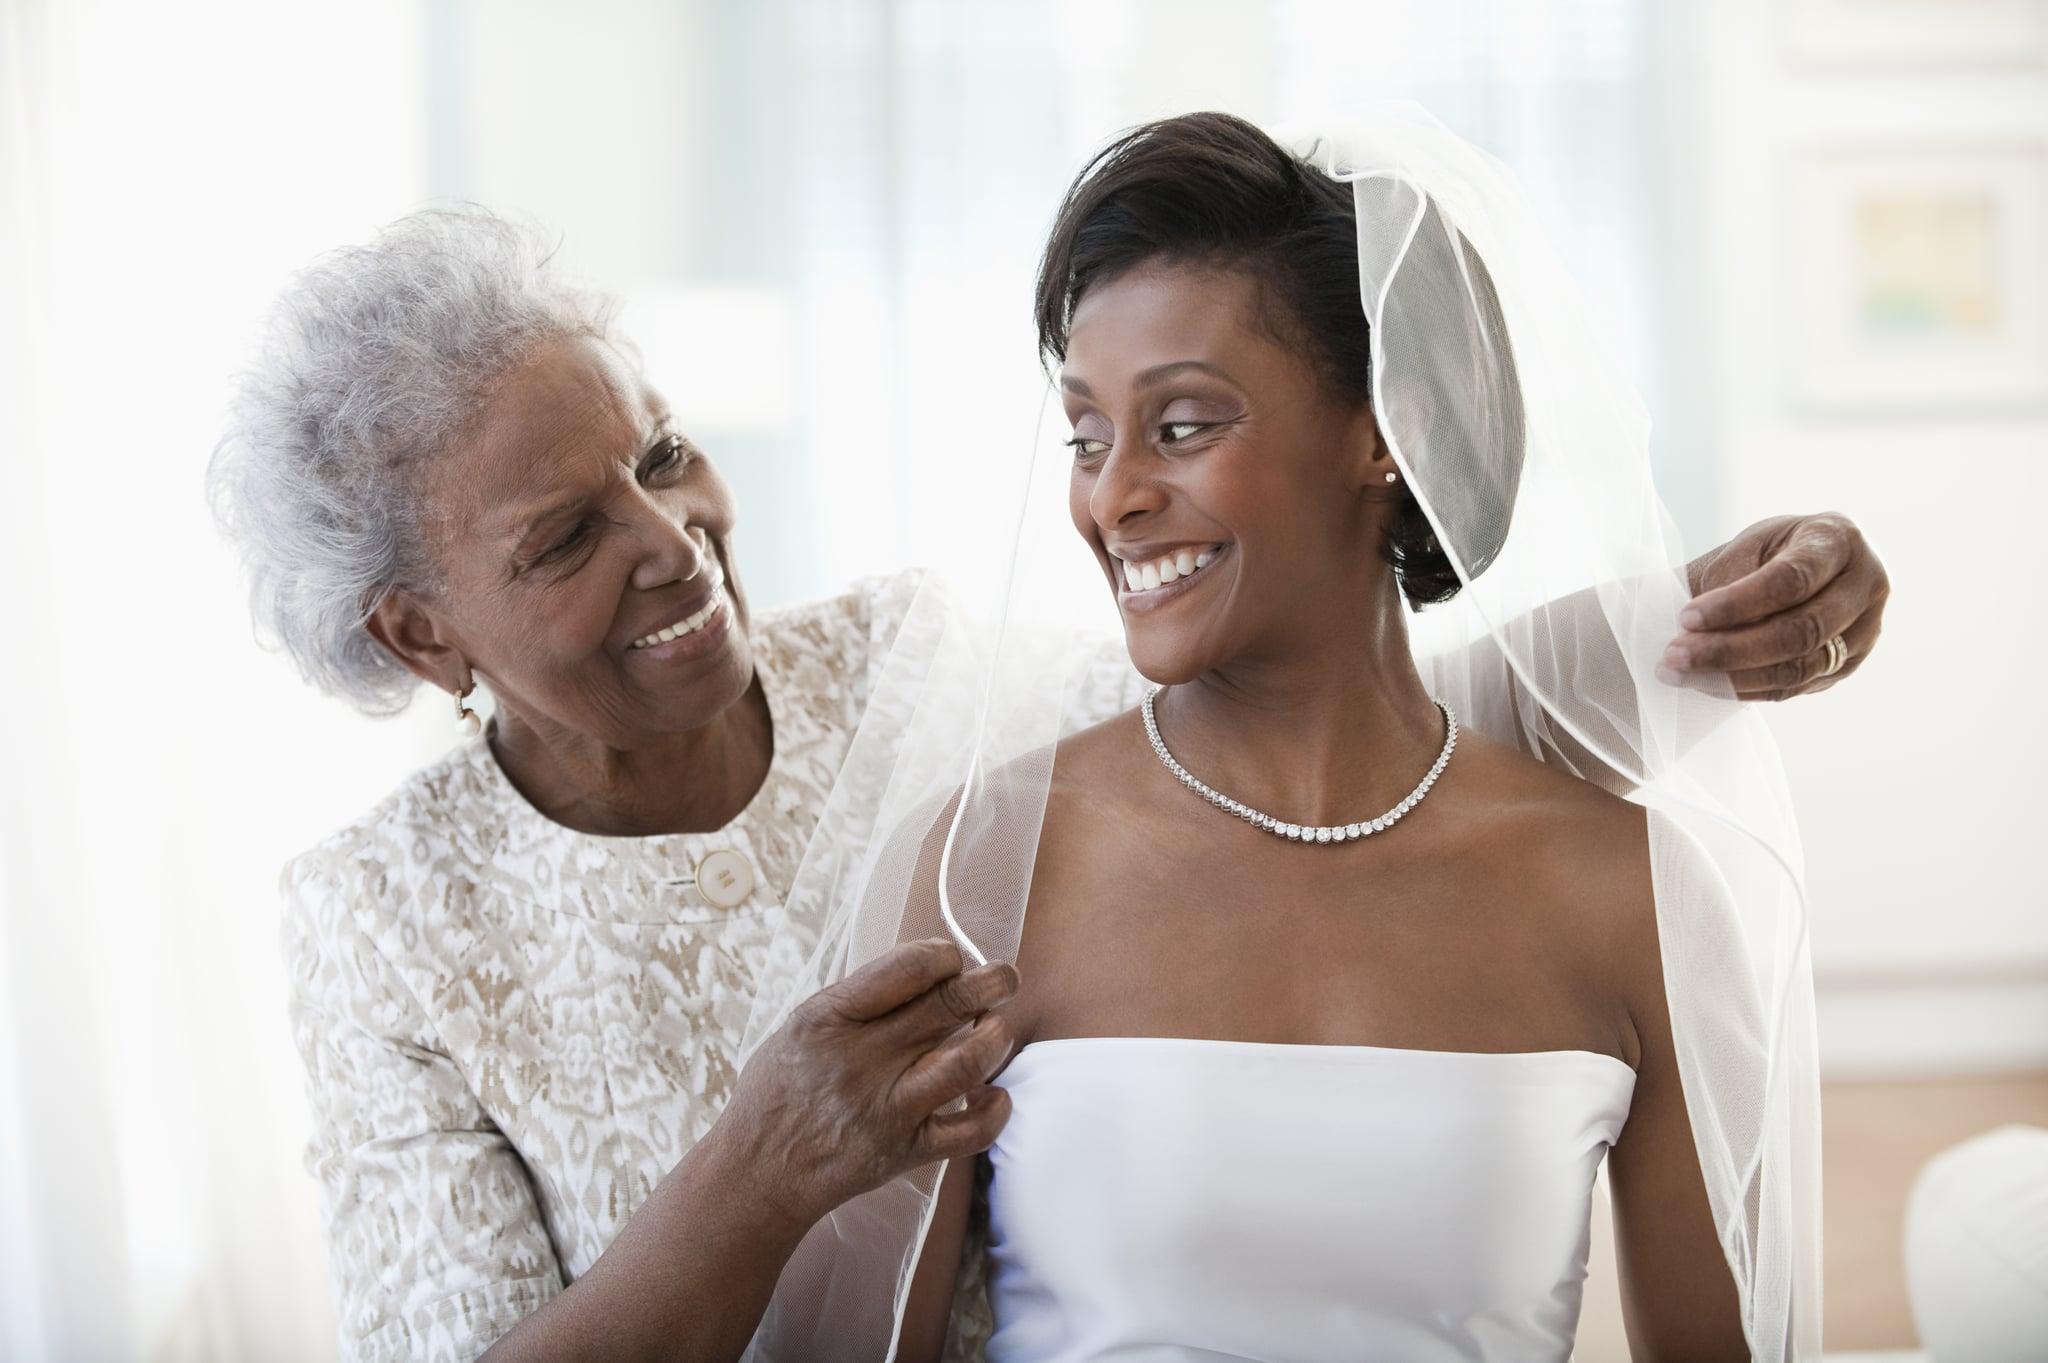 Grandmother helping granddaughter get ready on wedding